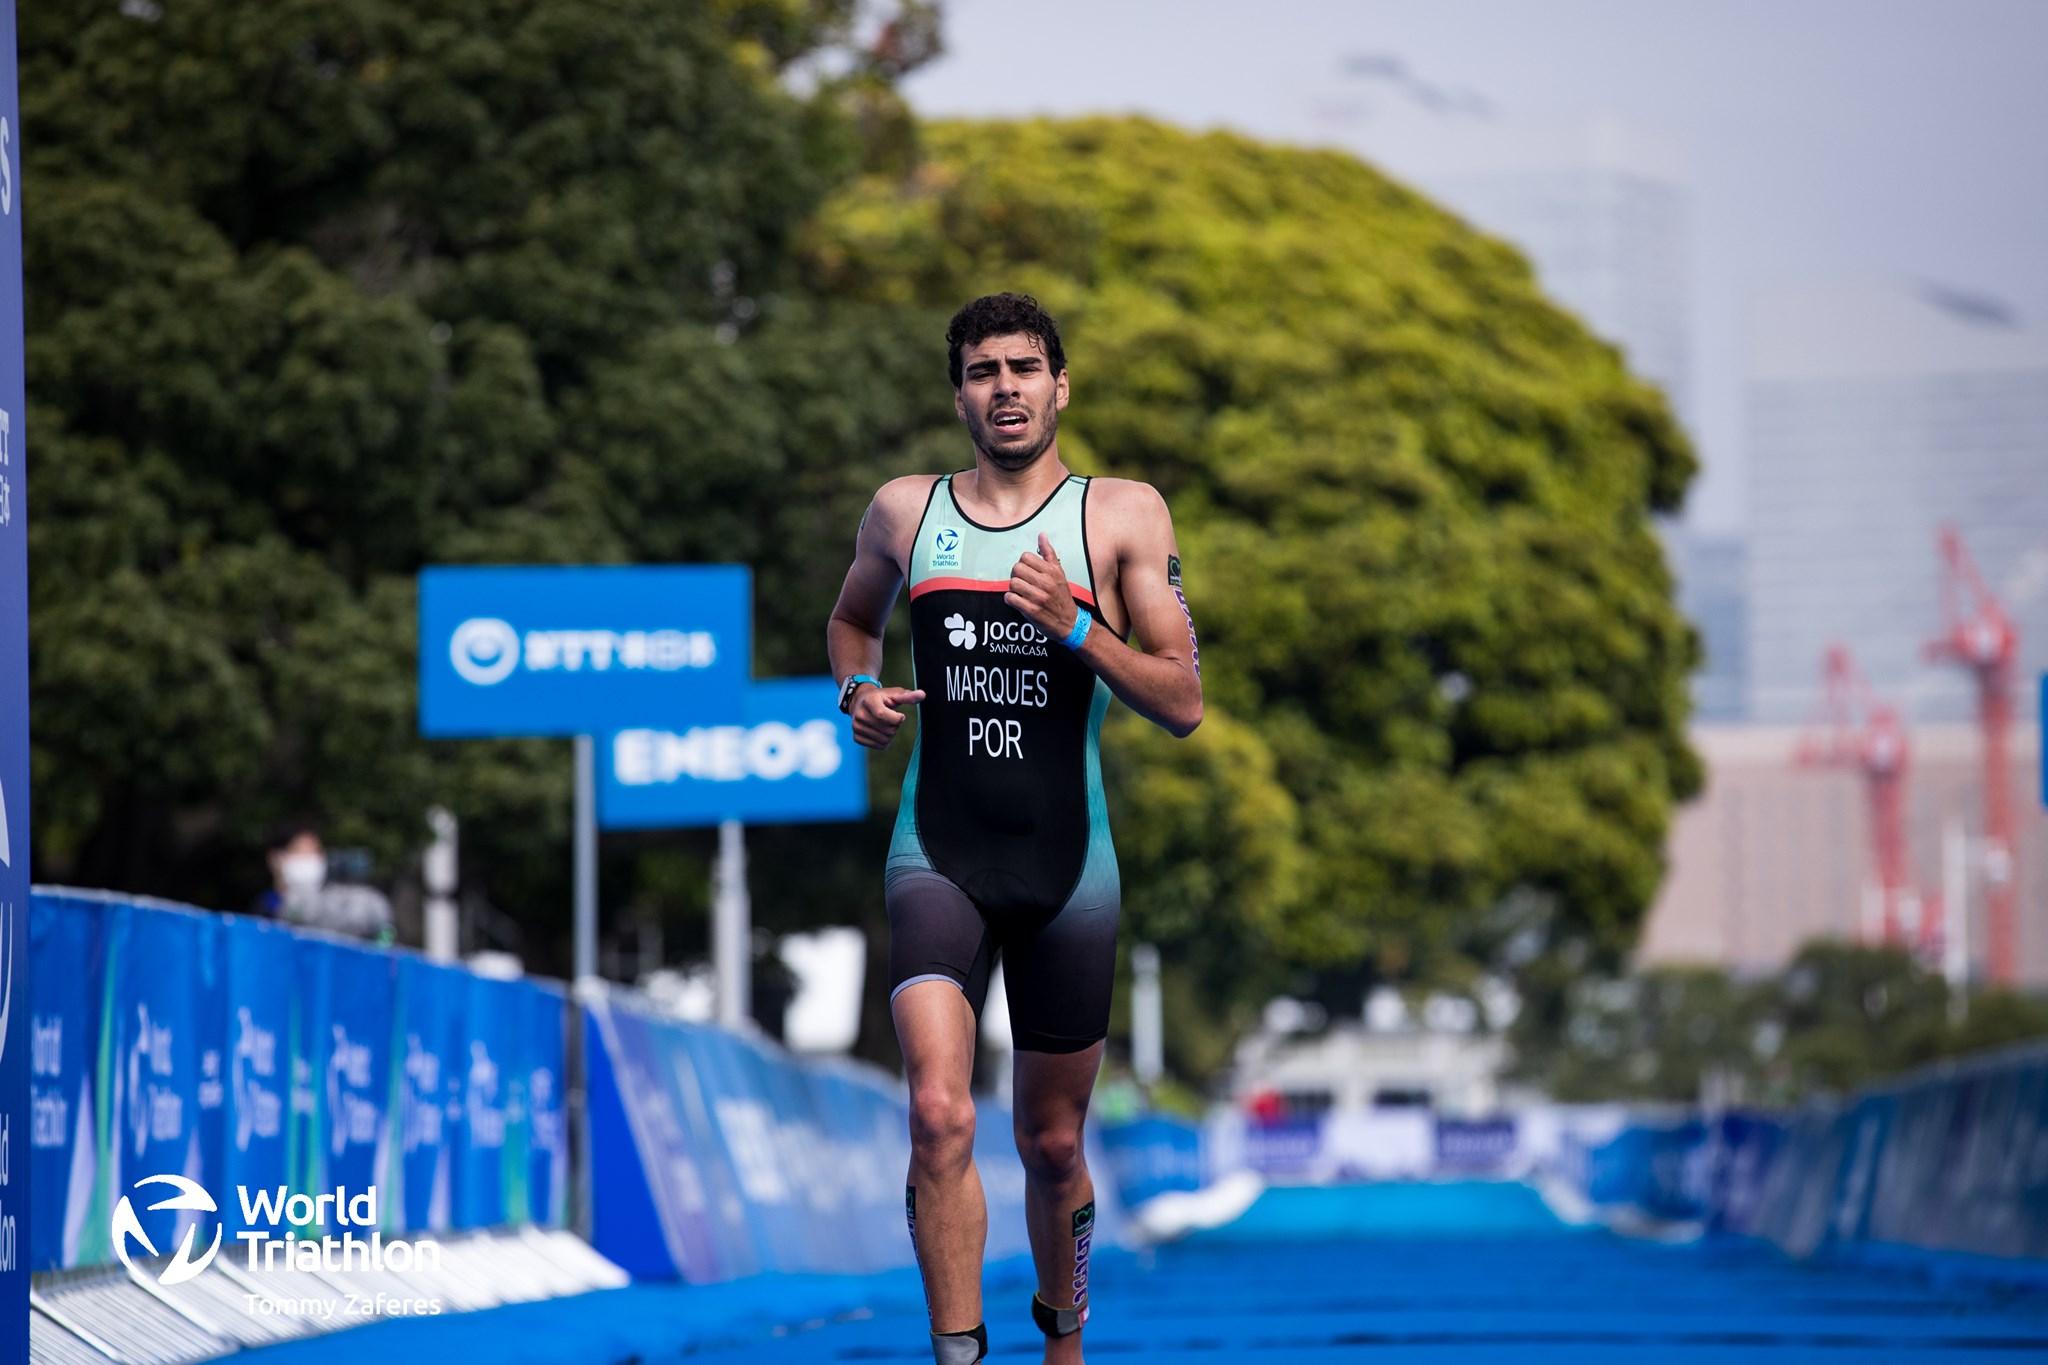 Filipe Marques conquista o bronze no Campeonato Europa de Paratriatlo 2021